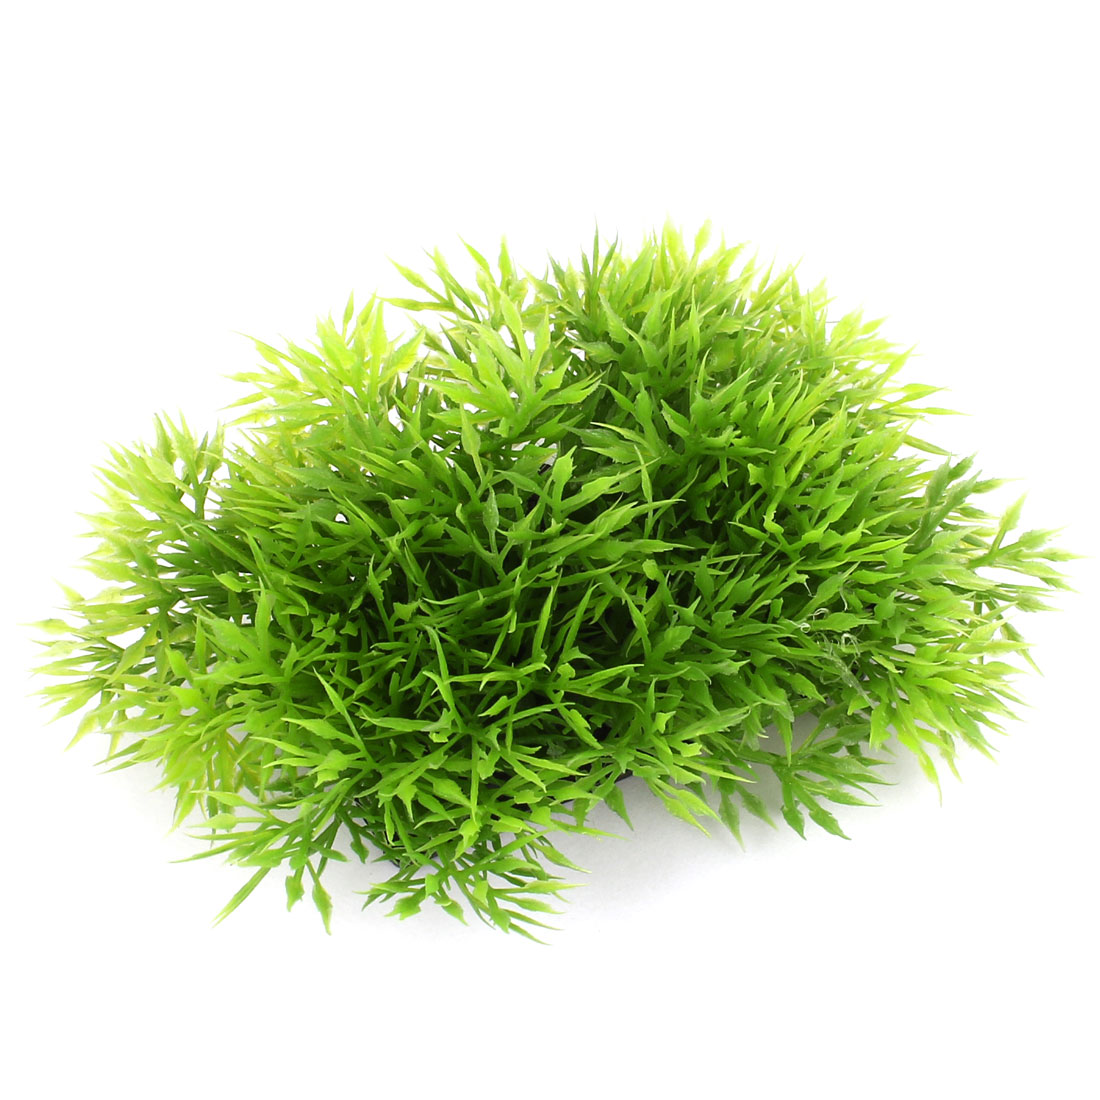 Unique Bargains Green Emulational Plastic Grass Water Plant Ornament for Aquarium - image 2 of 2